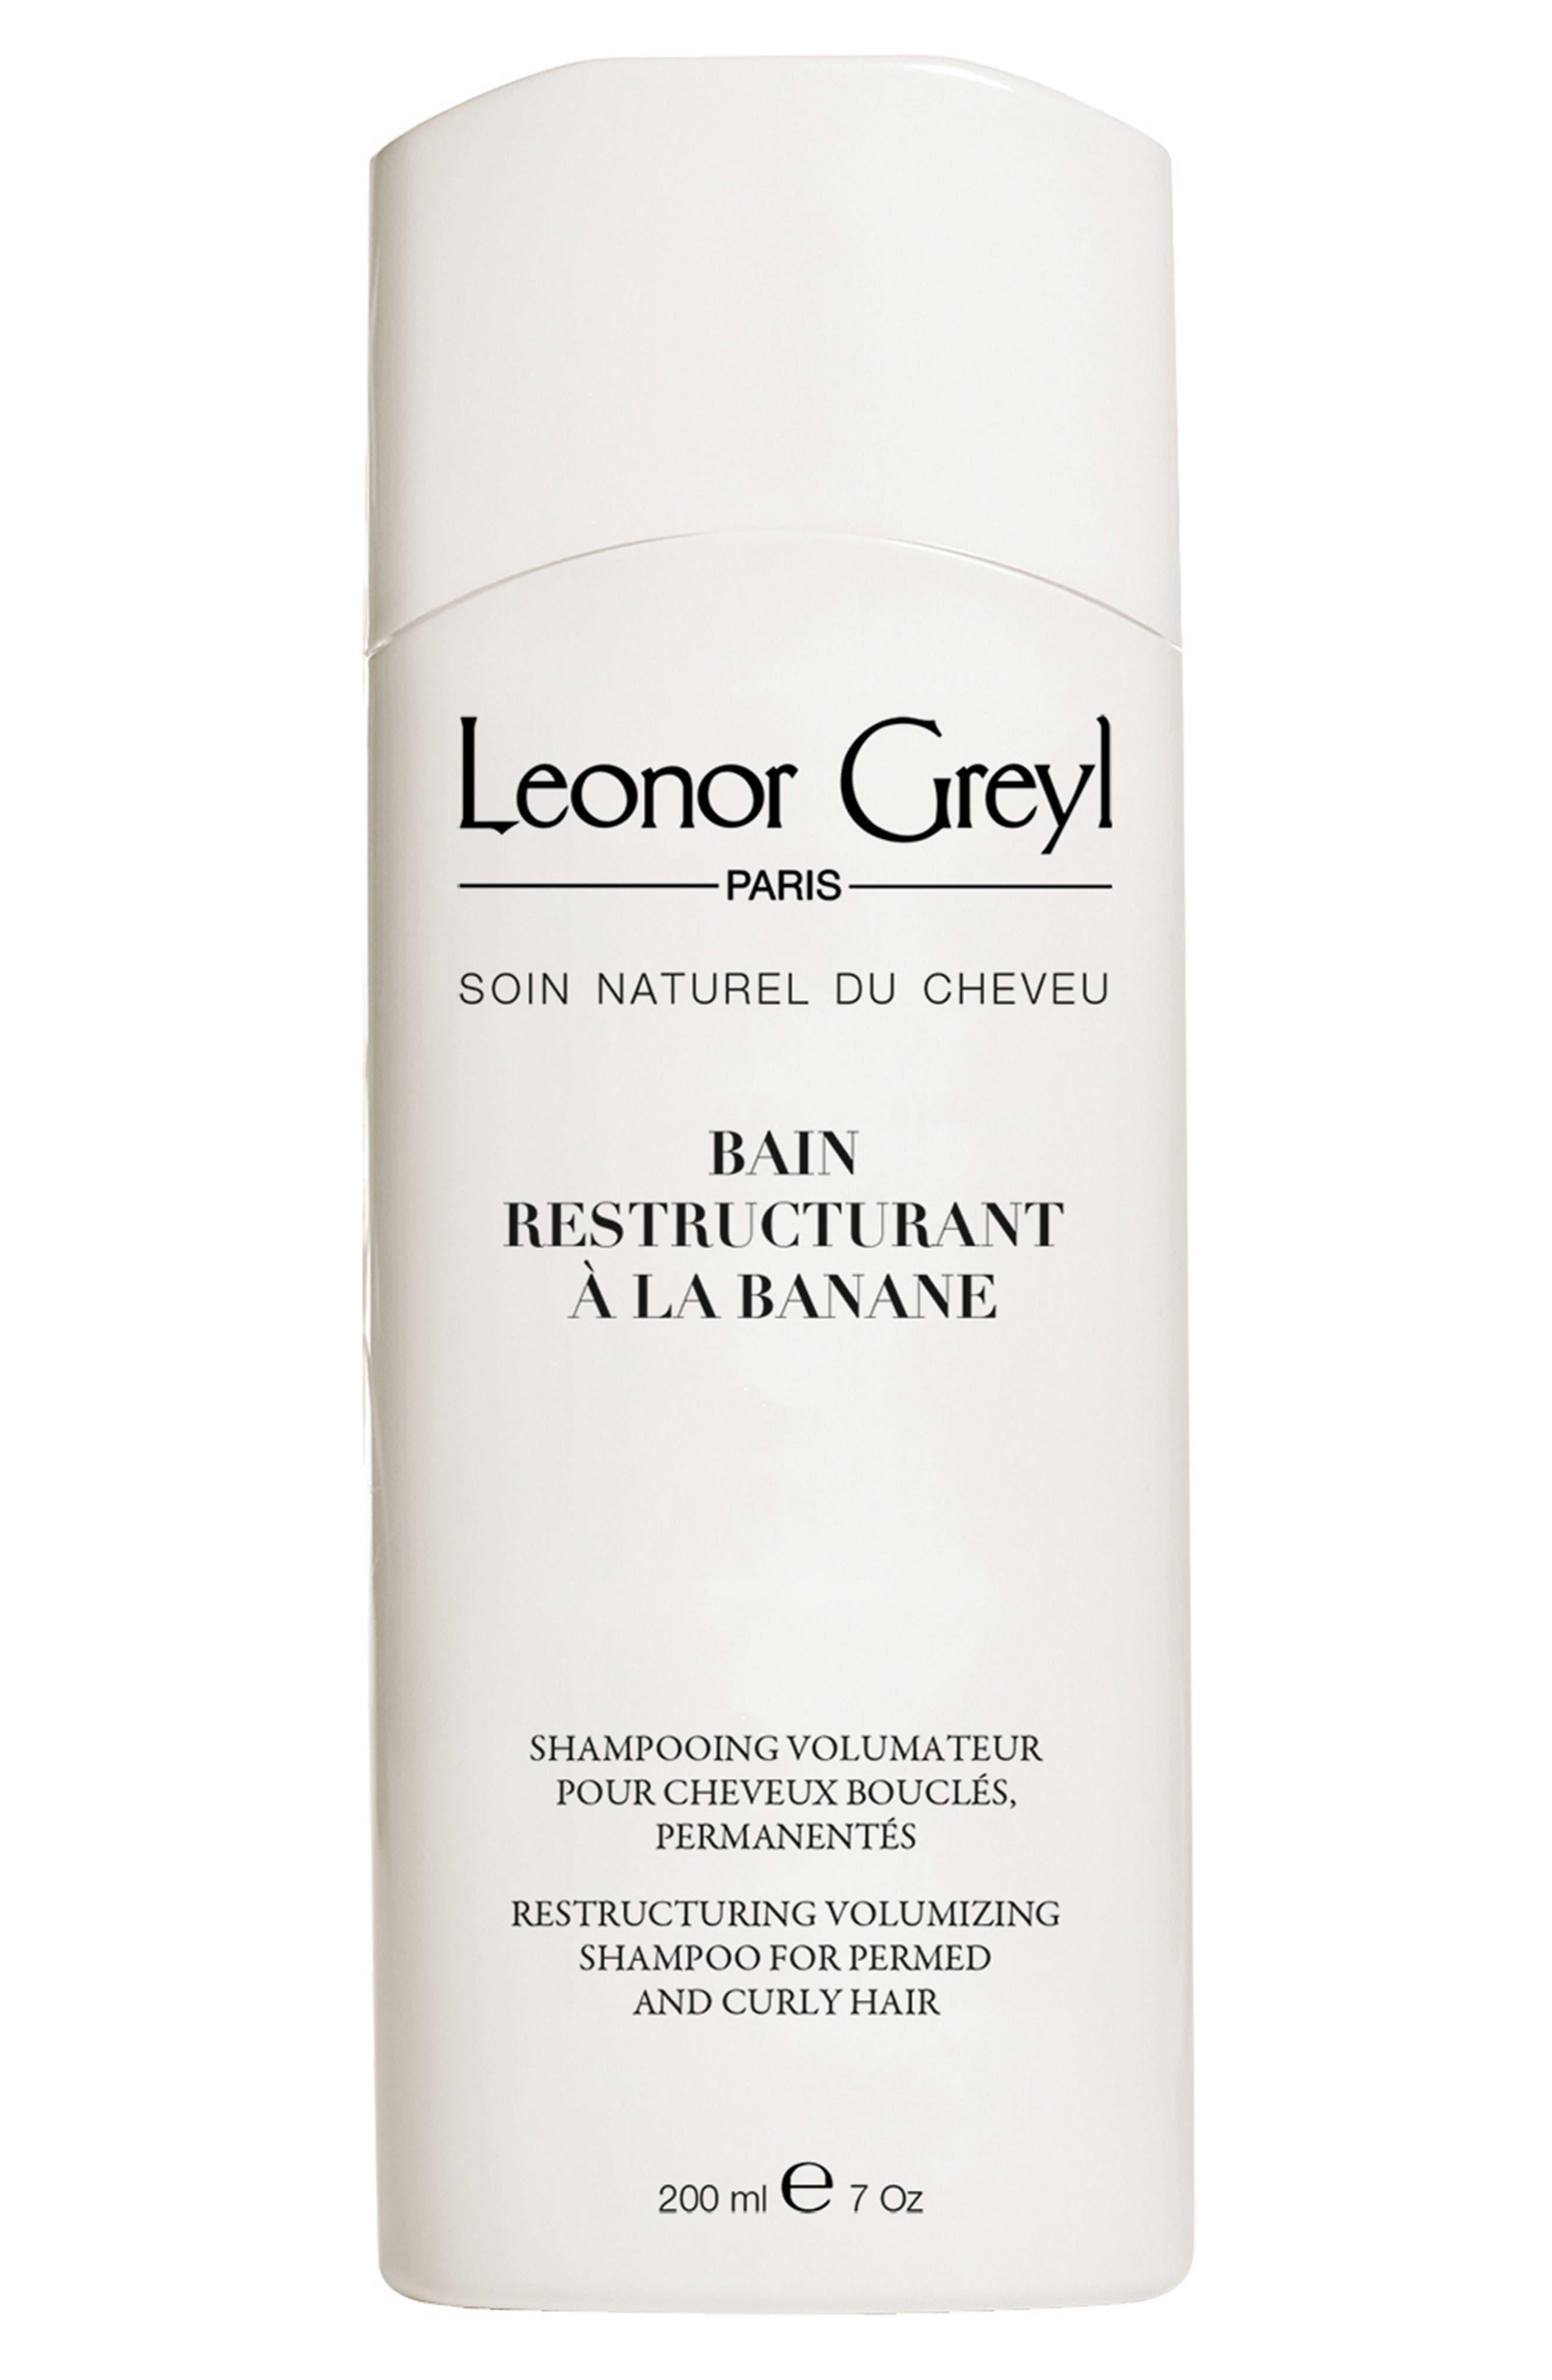 Leonor Greyl PARIS 'À la Banane' Restructuring Shampoo